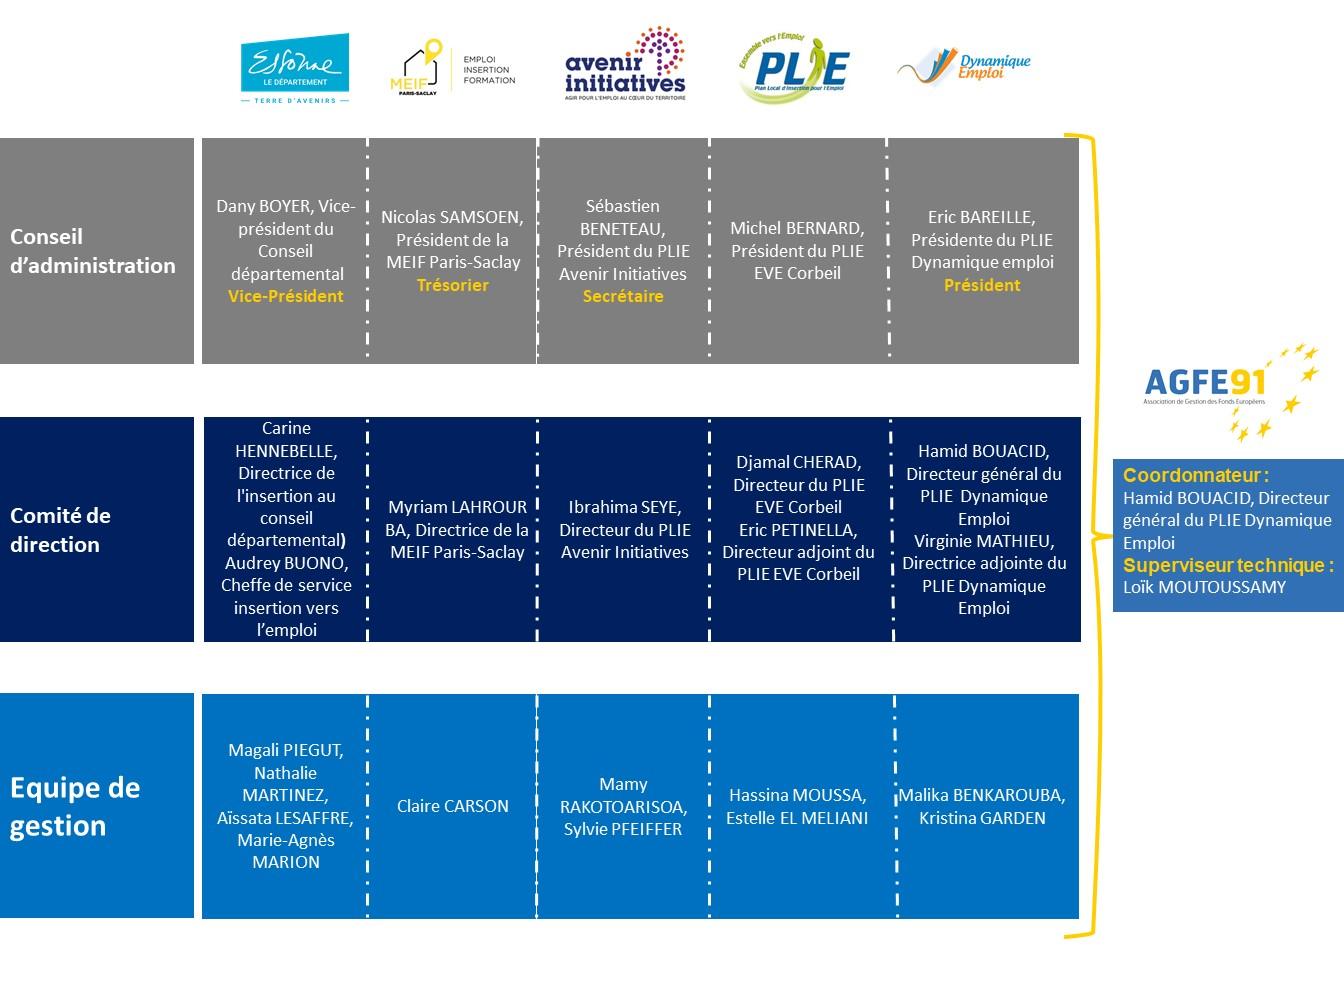 Organigramme de l'AGFE91